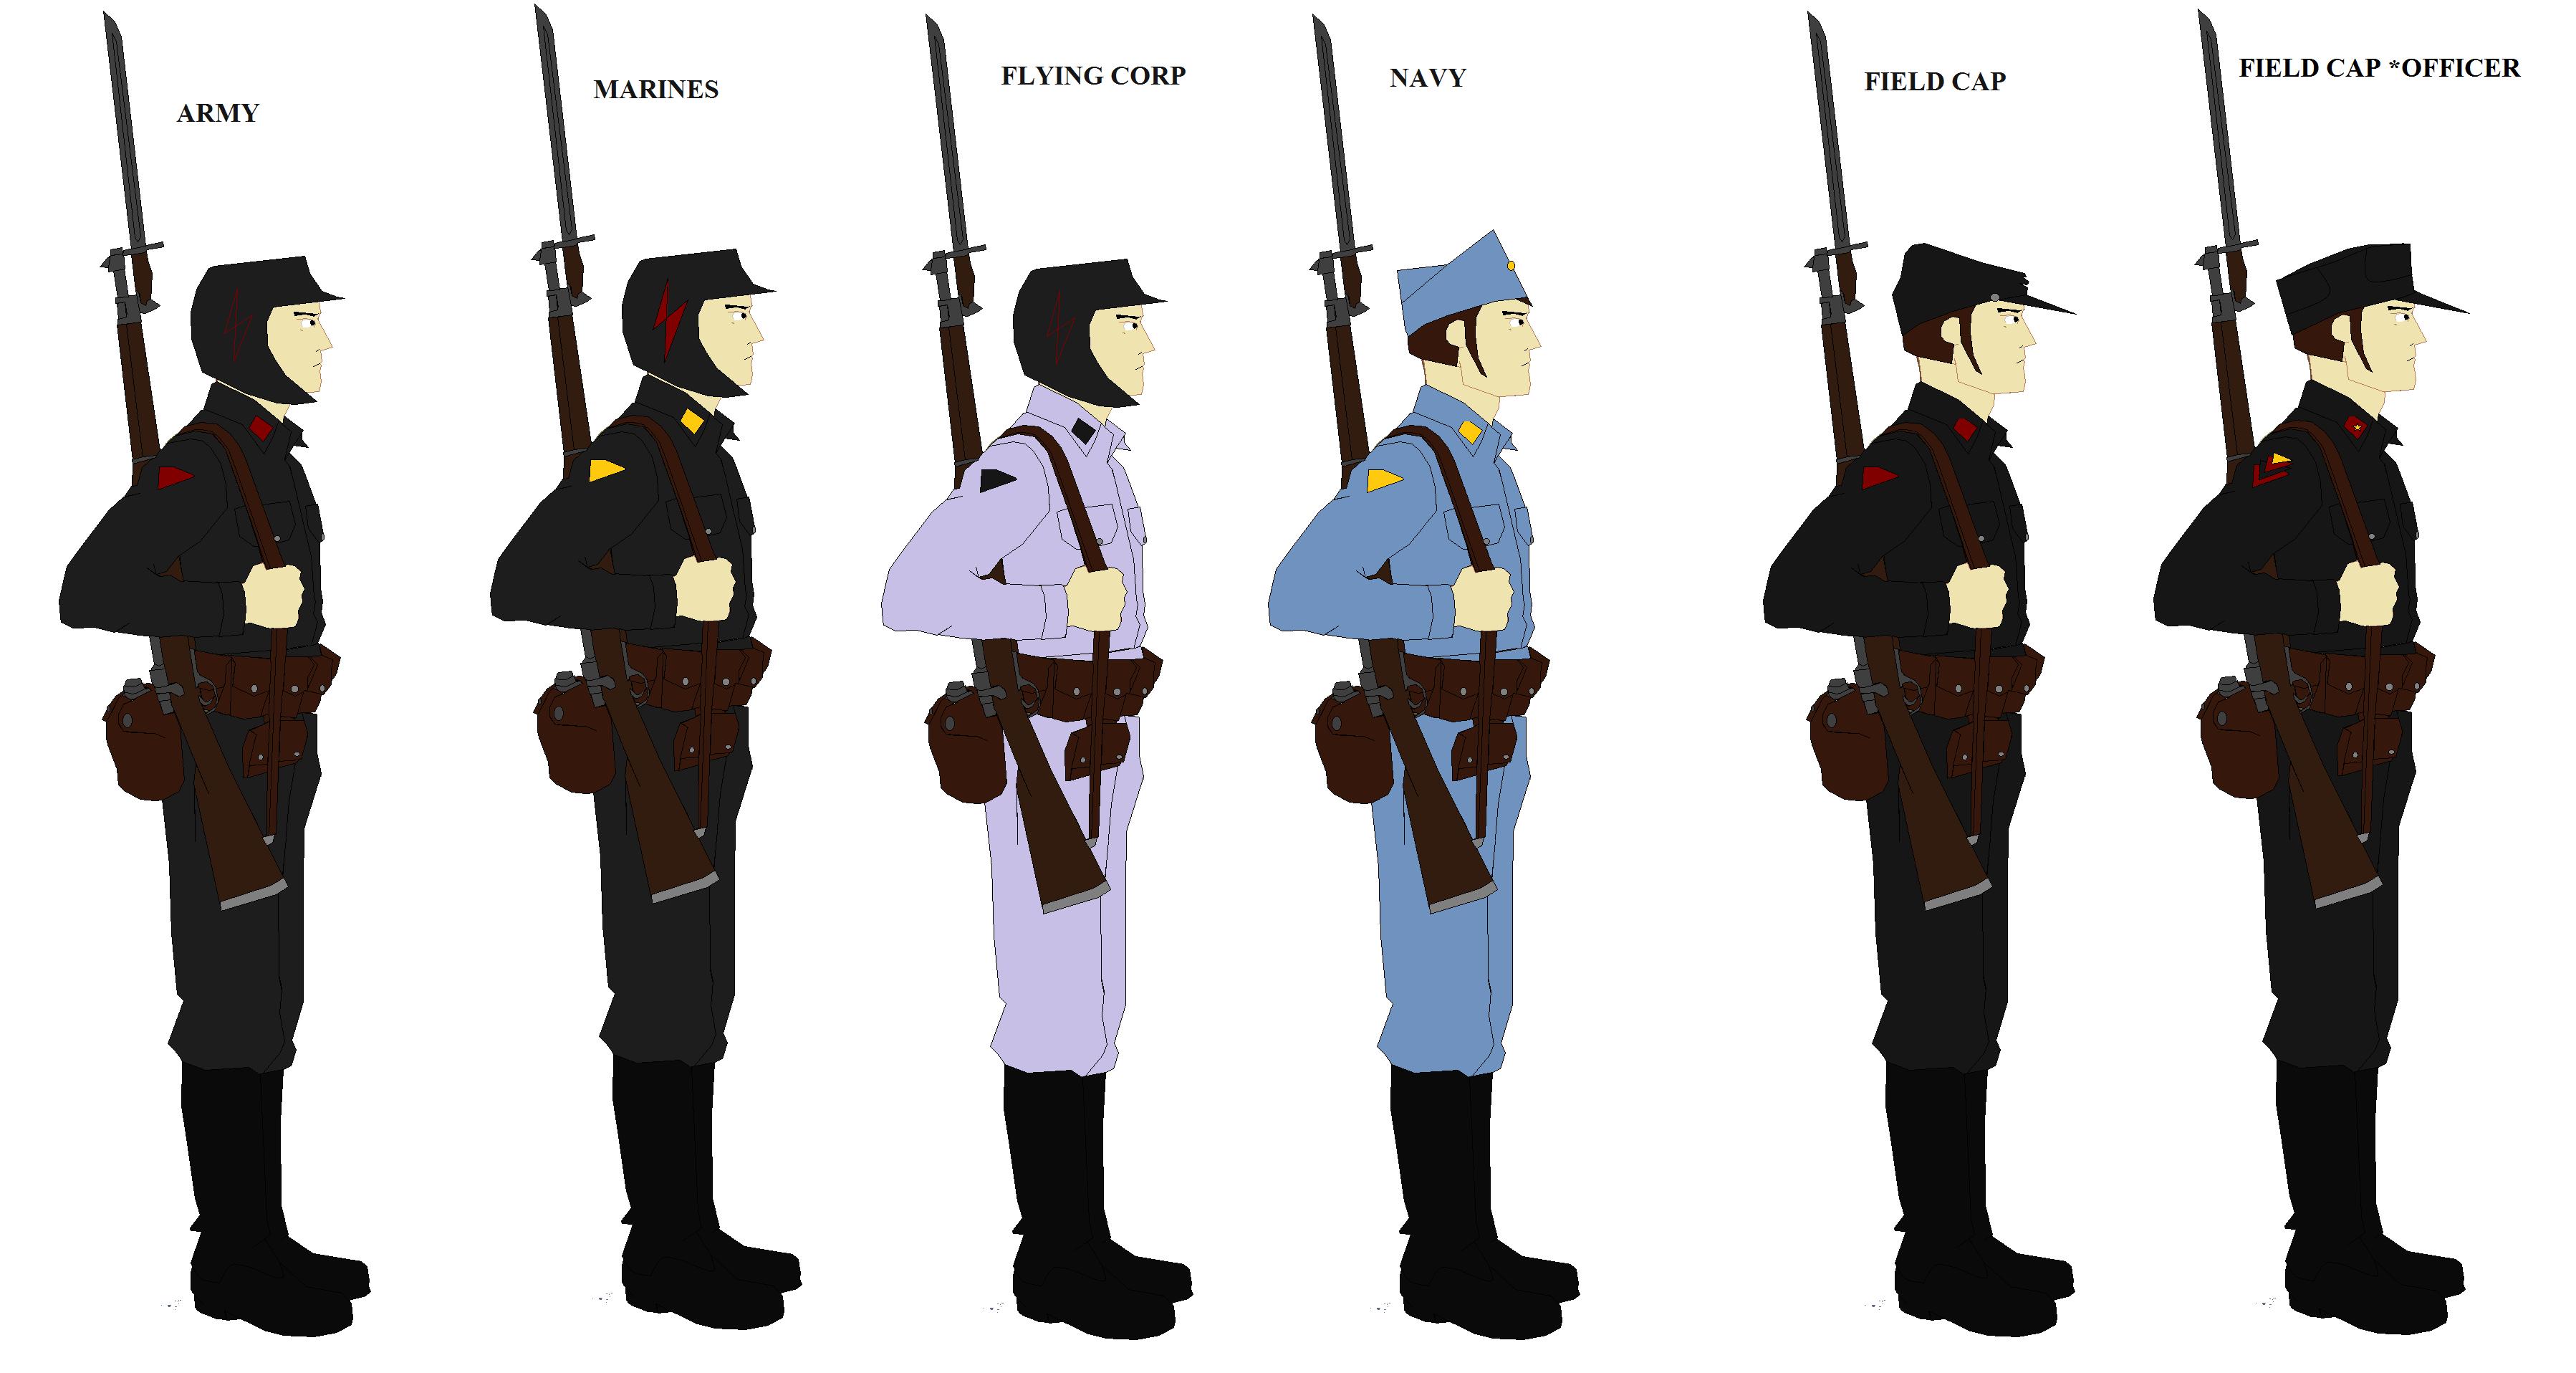 Spartan Uniforms By Soundwave3591 On Deviantart